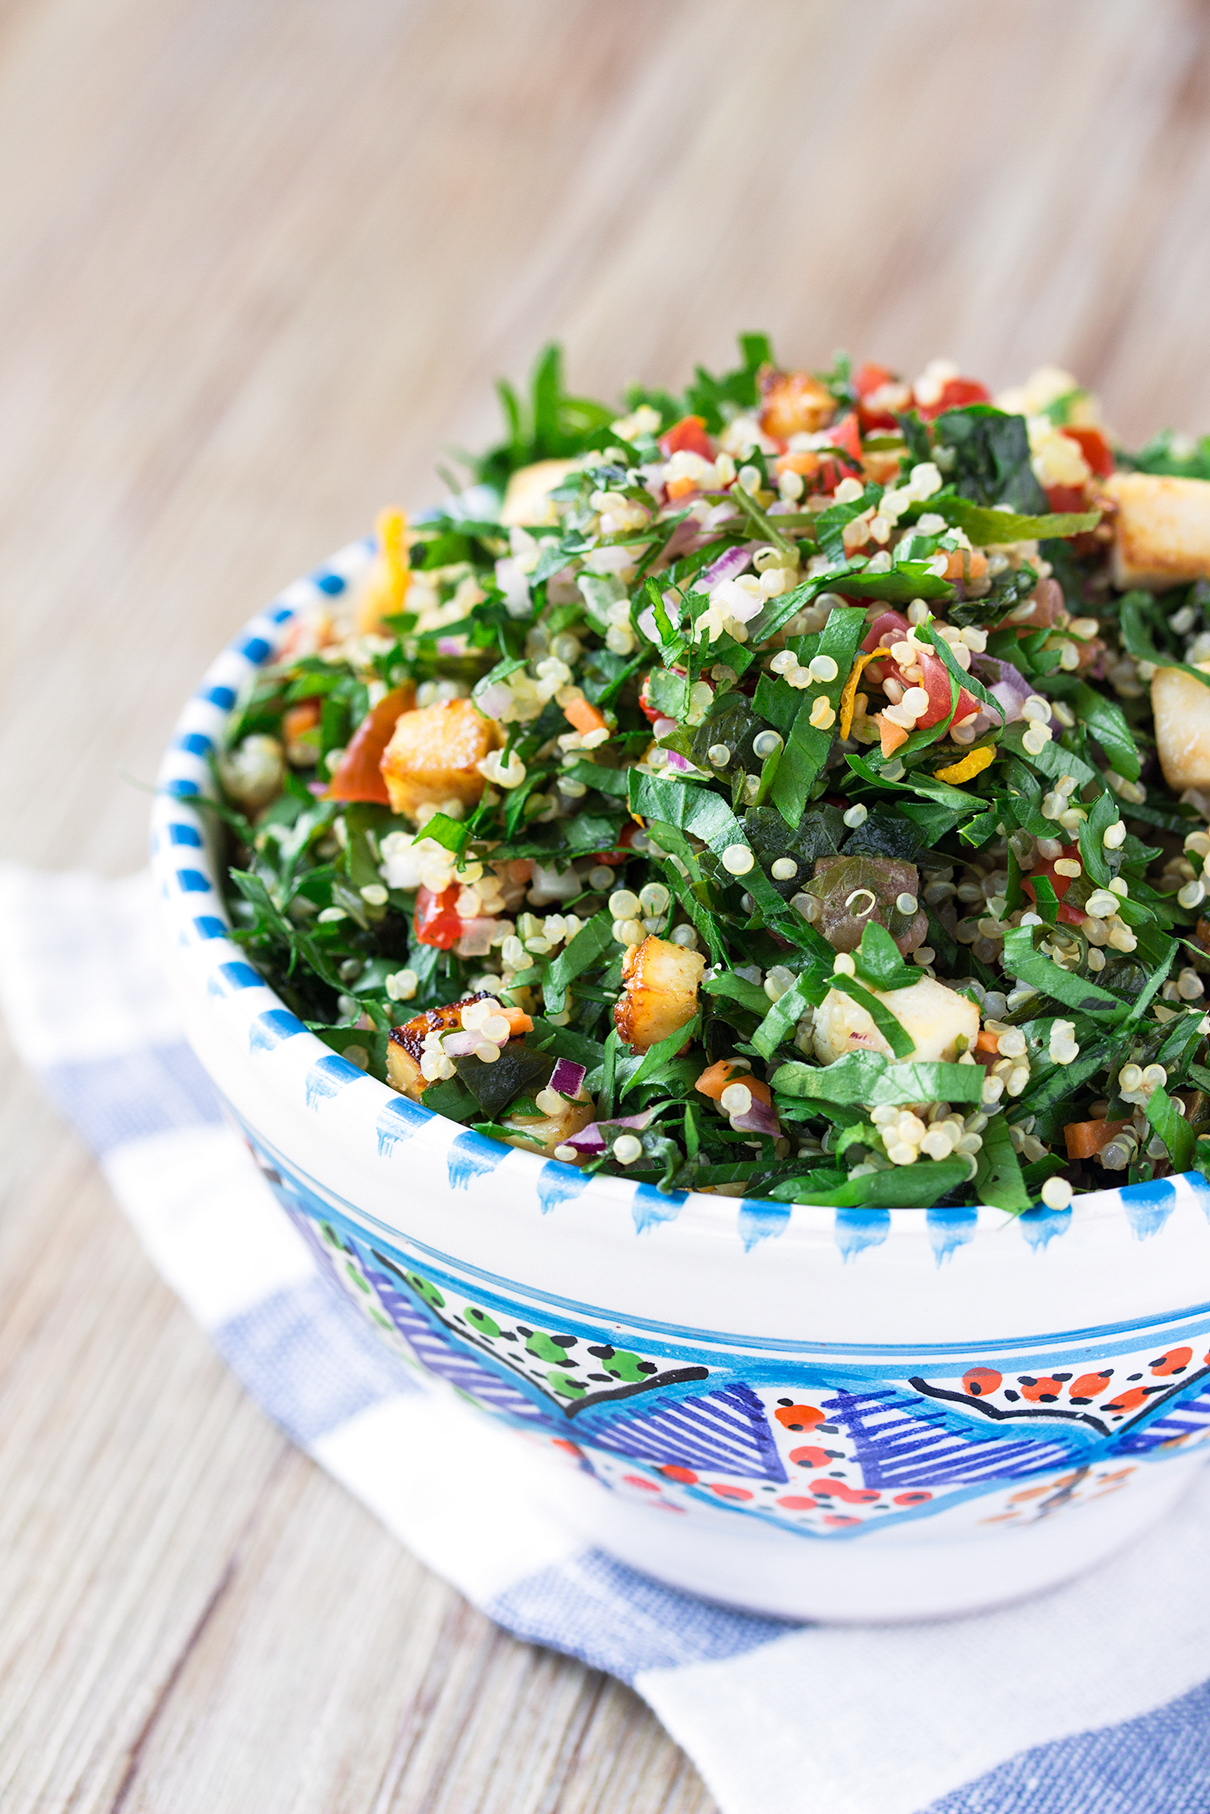 QUINOA TOFU TABBOULEH |Vegan + Gluten Free